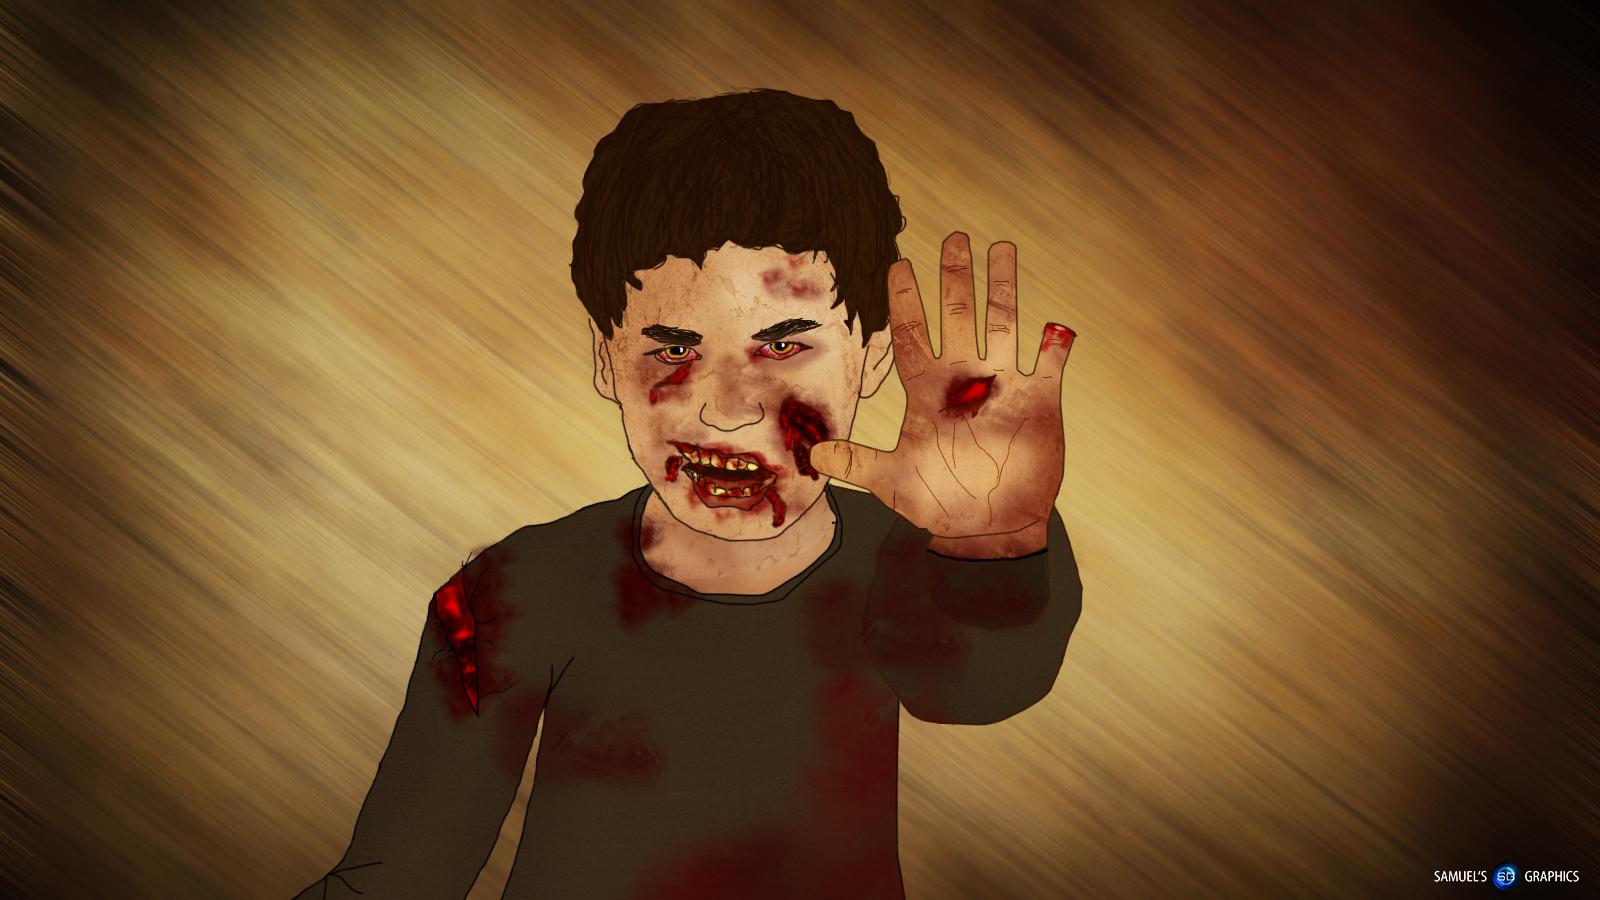 Drawn wallpaper zombie Zombie boy Samuels drawing by